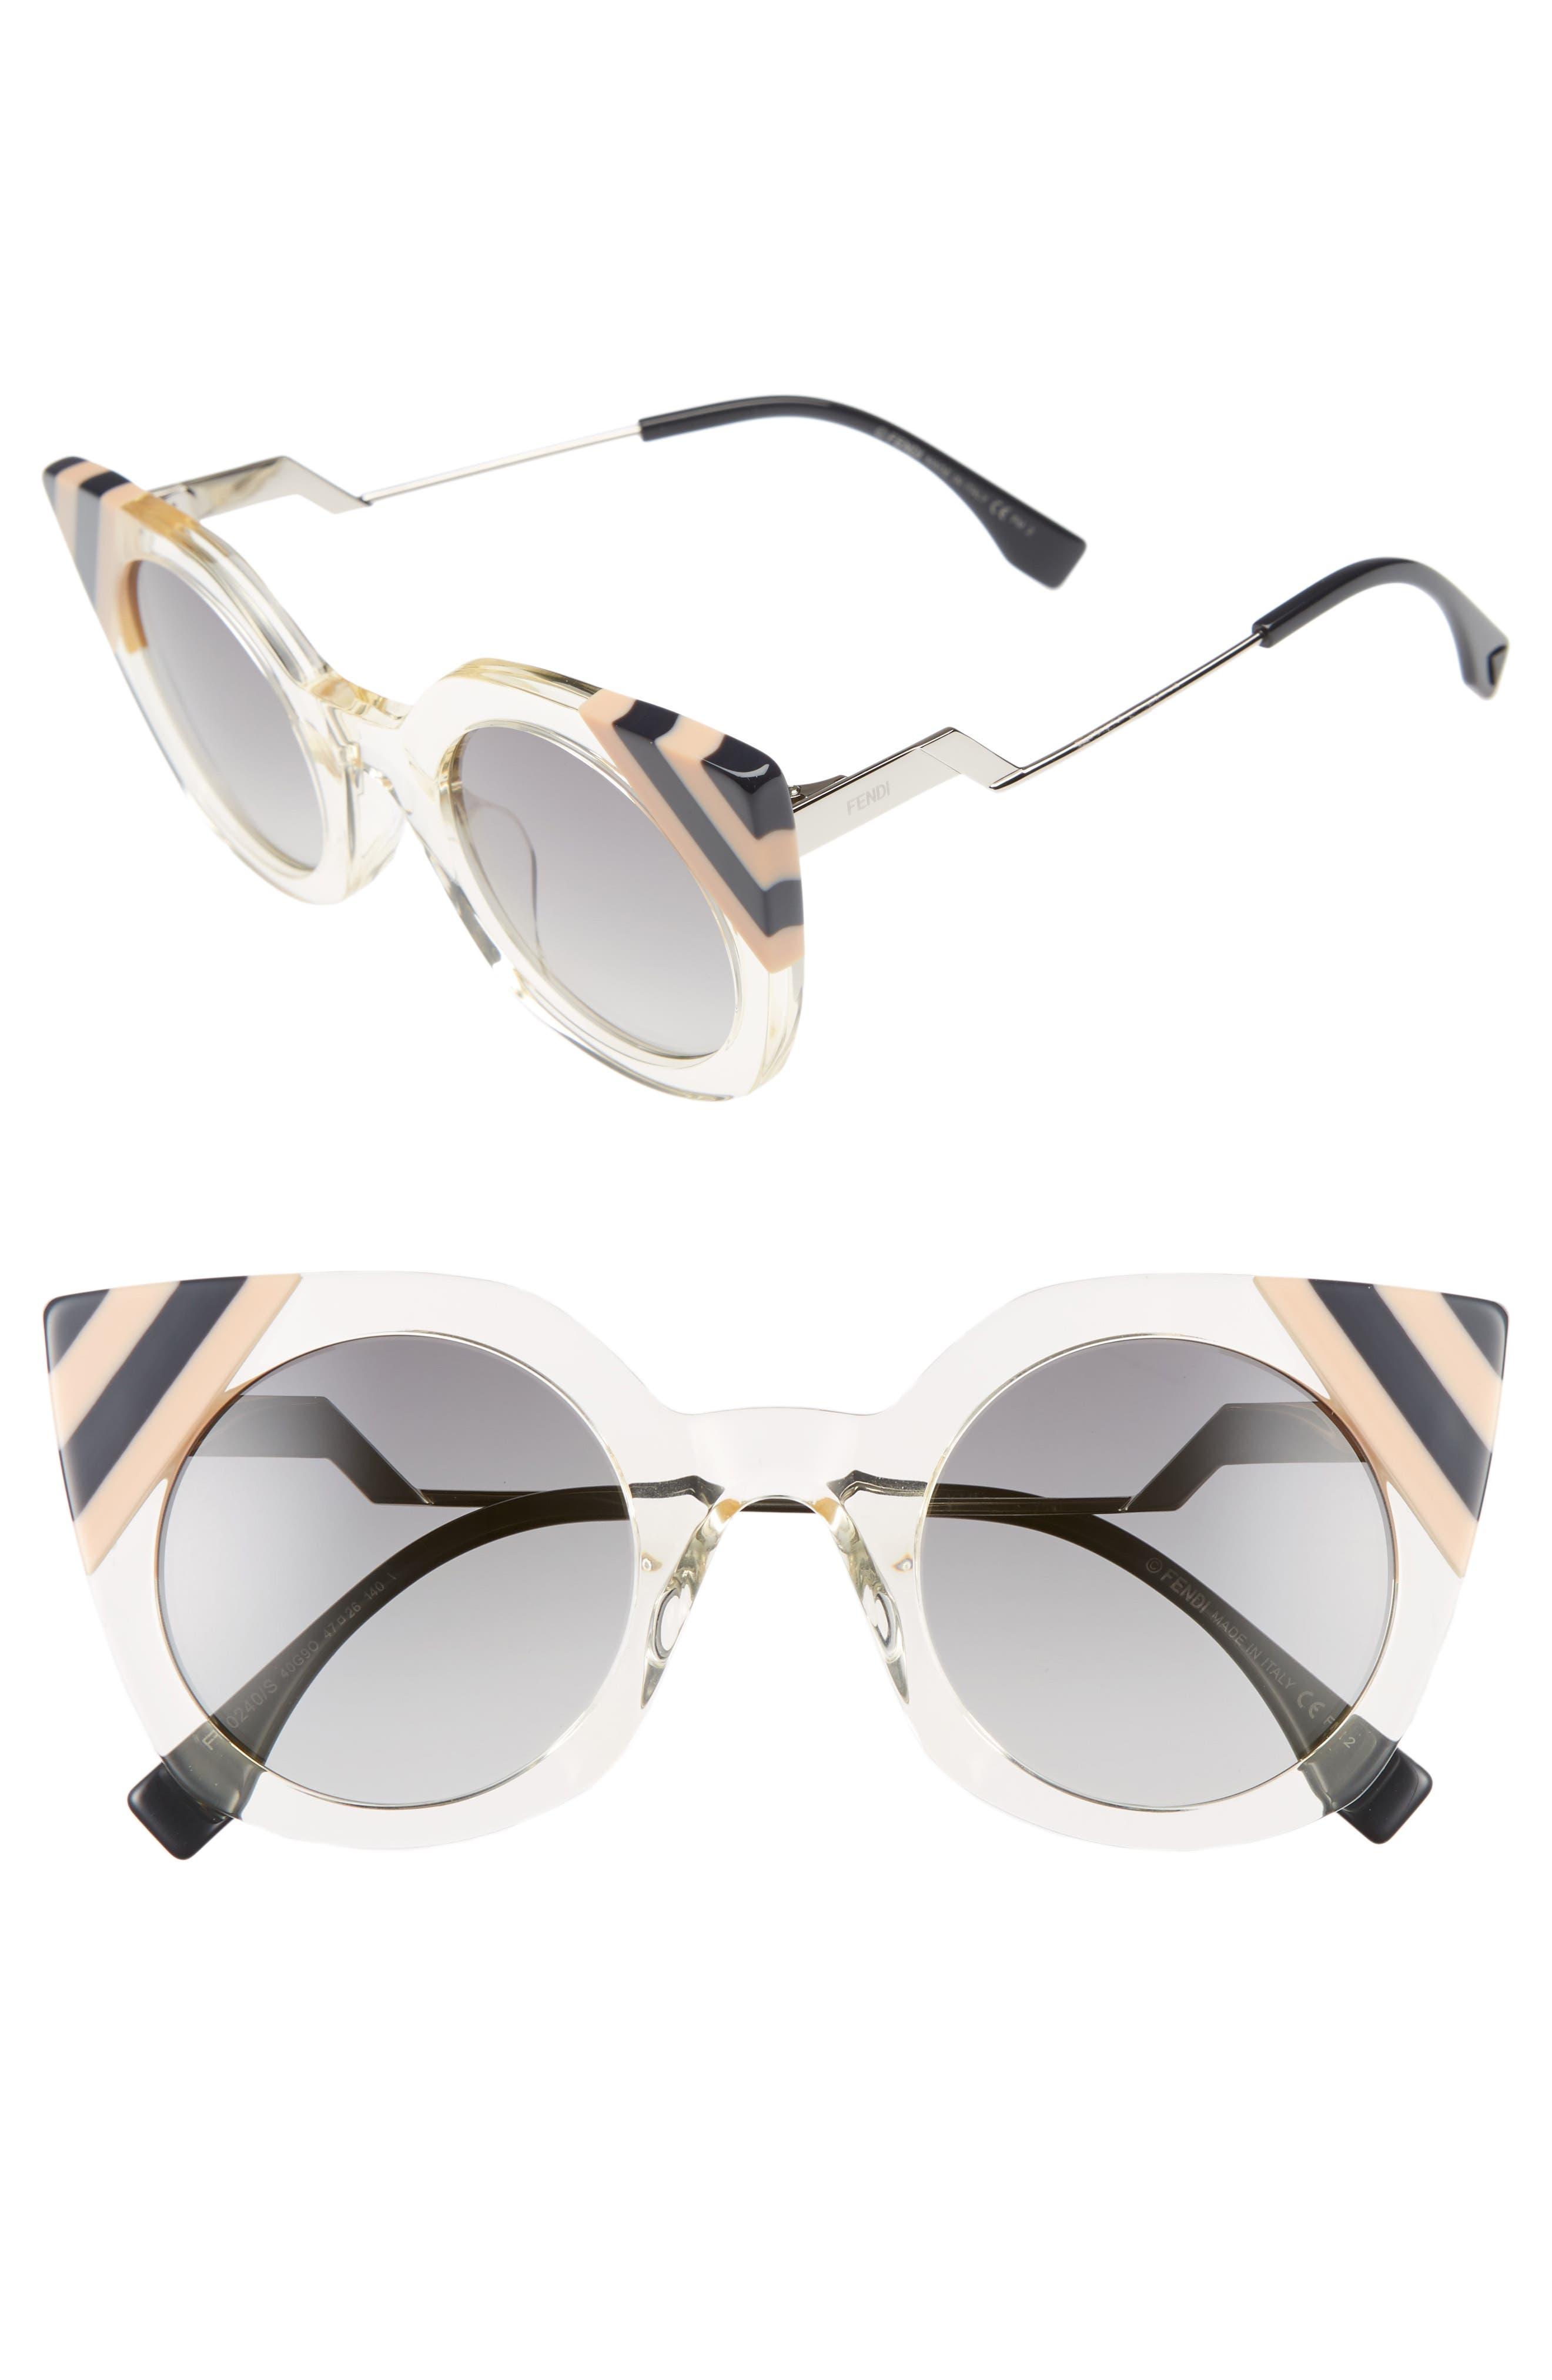 47mm Cat Eye Sunglasses,                             Main thumbnail 4, color,